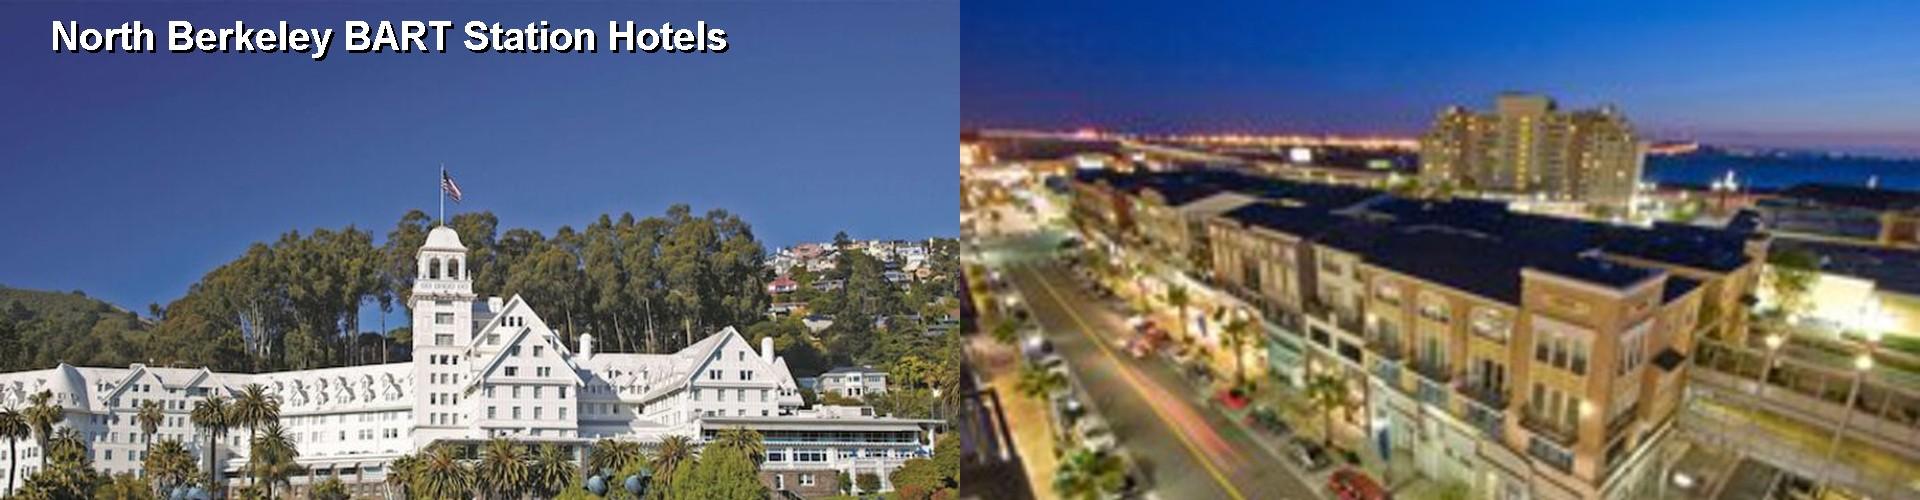 5 Best Hotels Near North Berkeley Bart Station